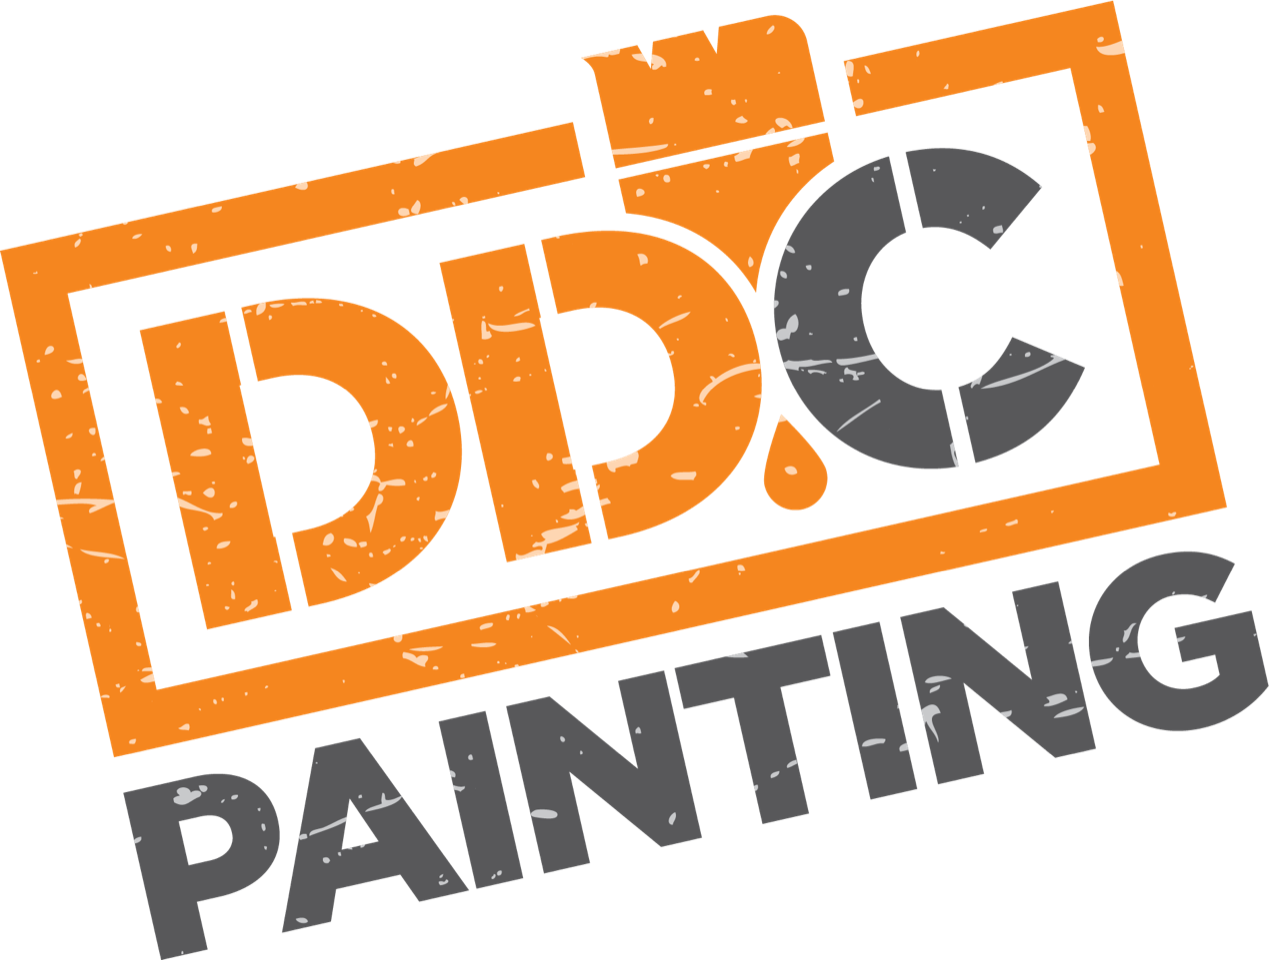 ddc painting logo